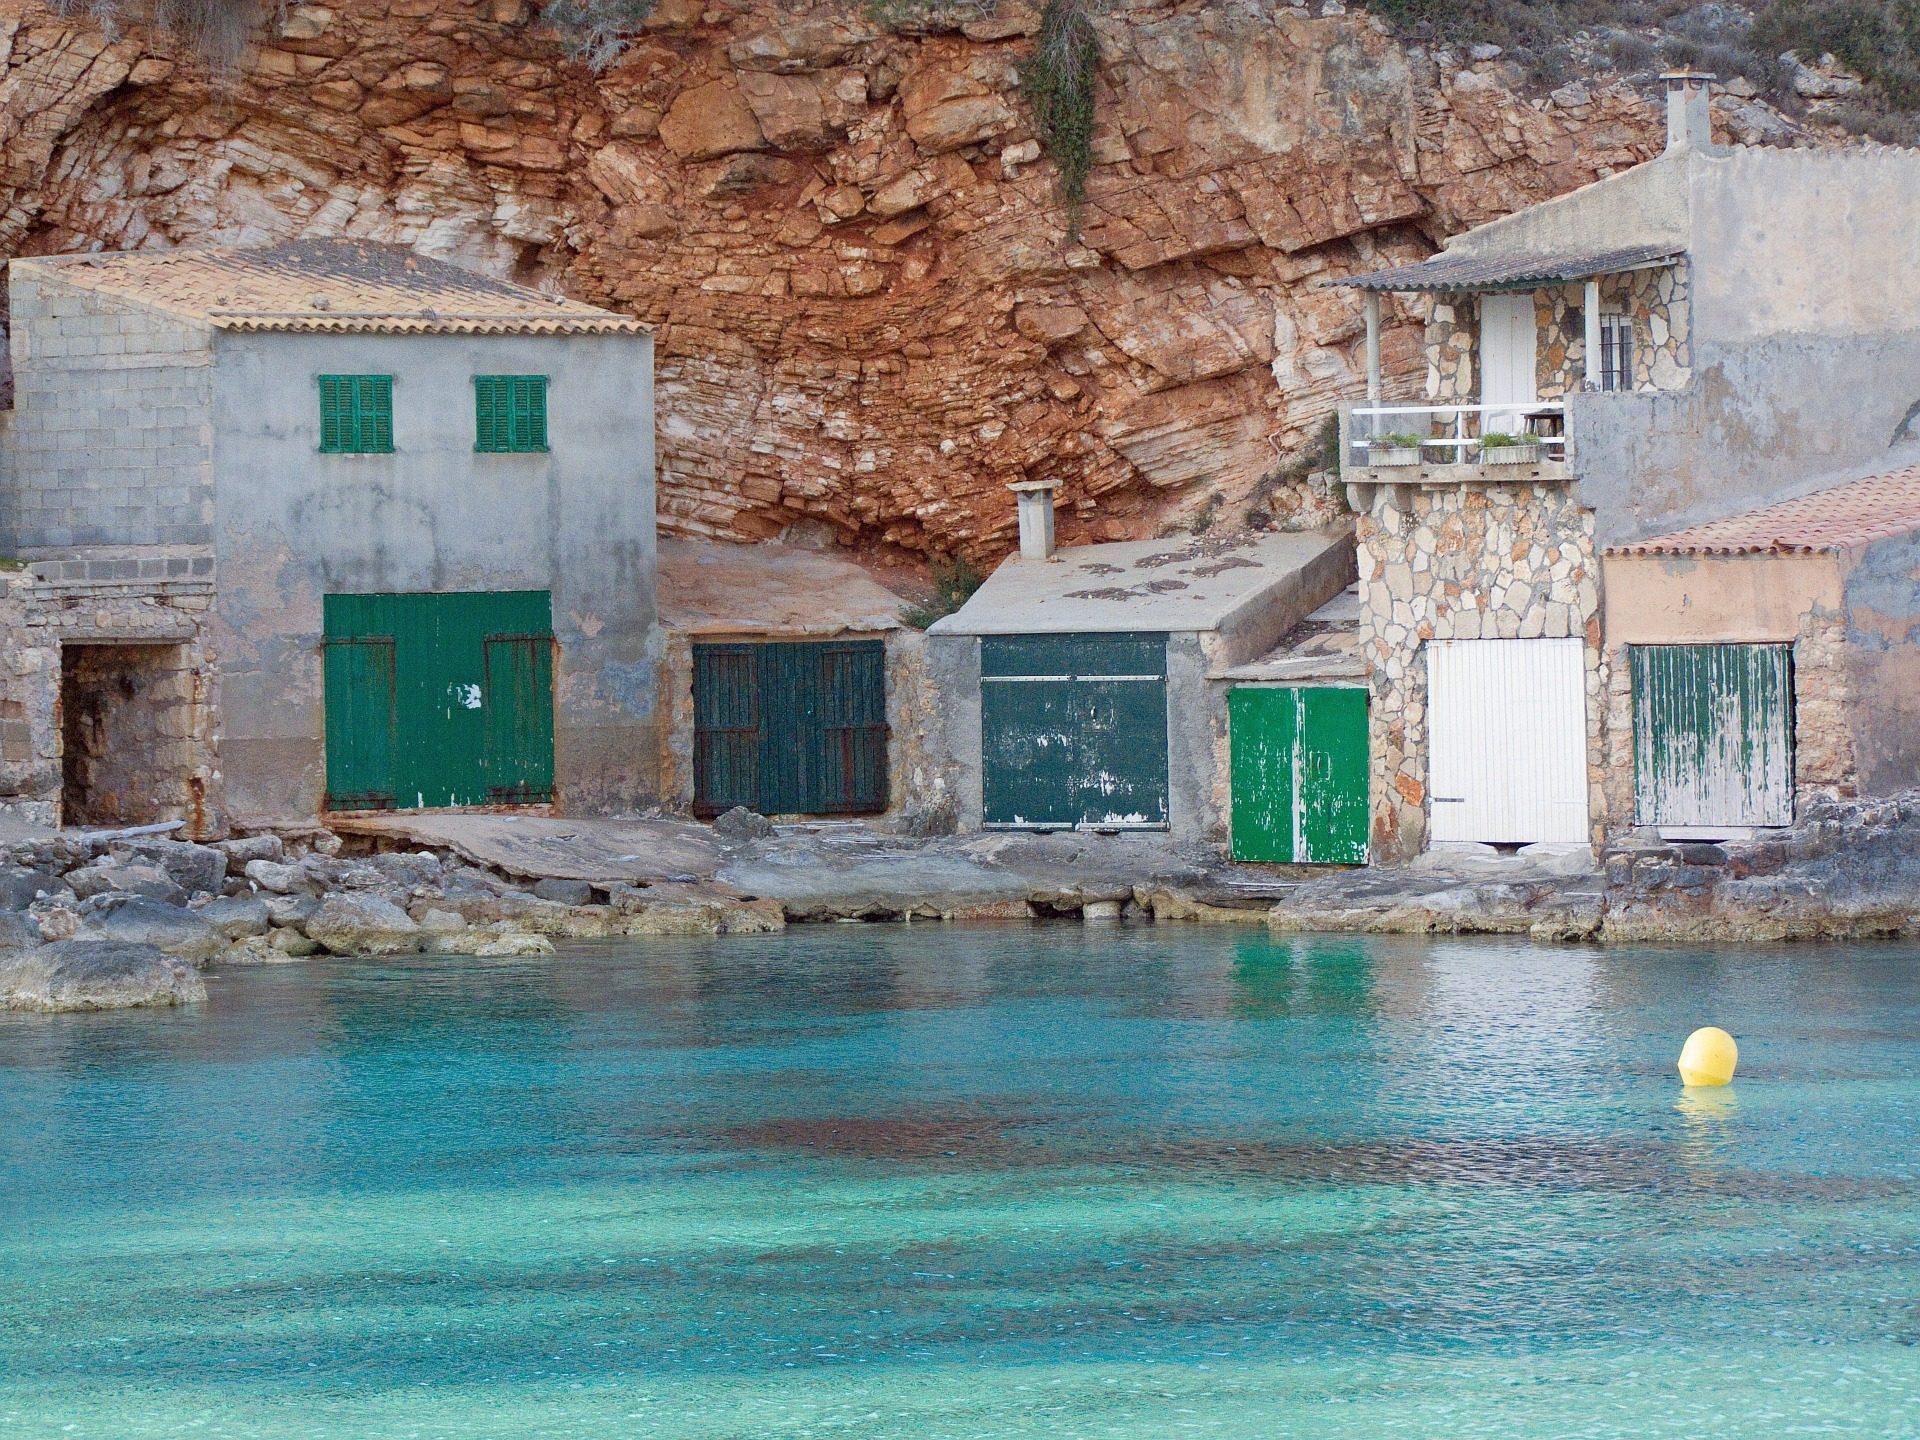 Auszeit auf Mallorca schon ab 66,00€ Flug & Hotel auf Palma de Mallorca